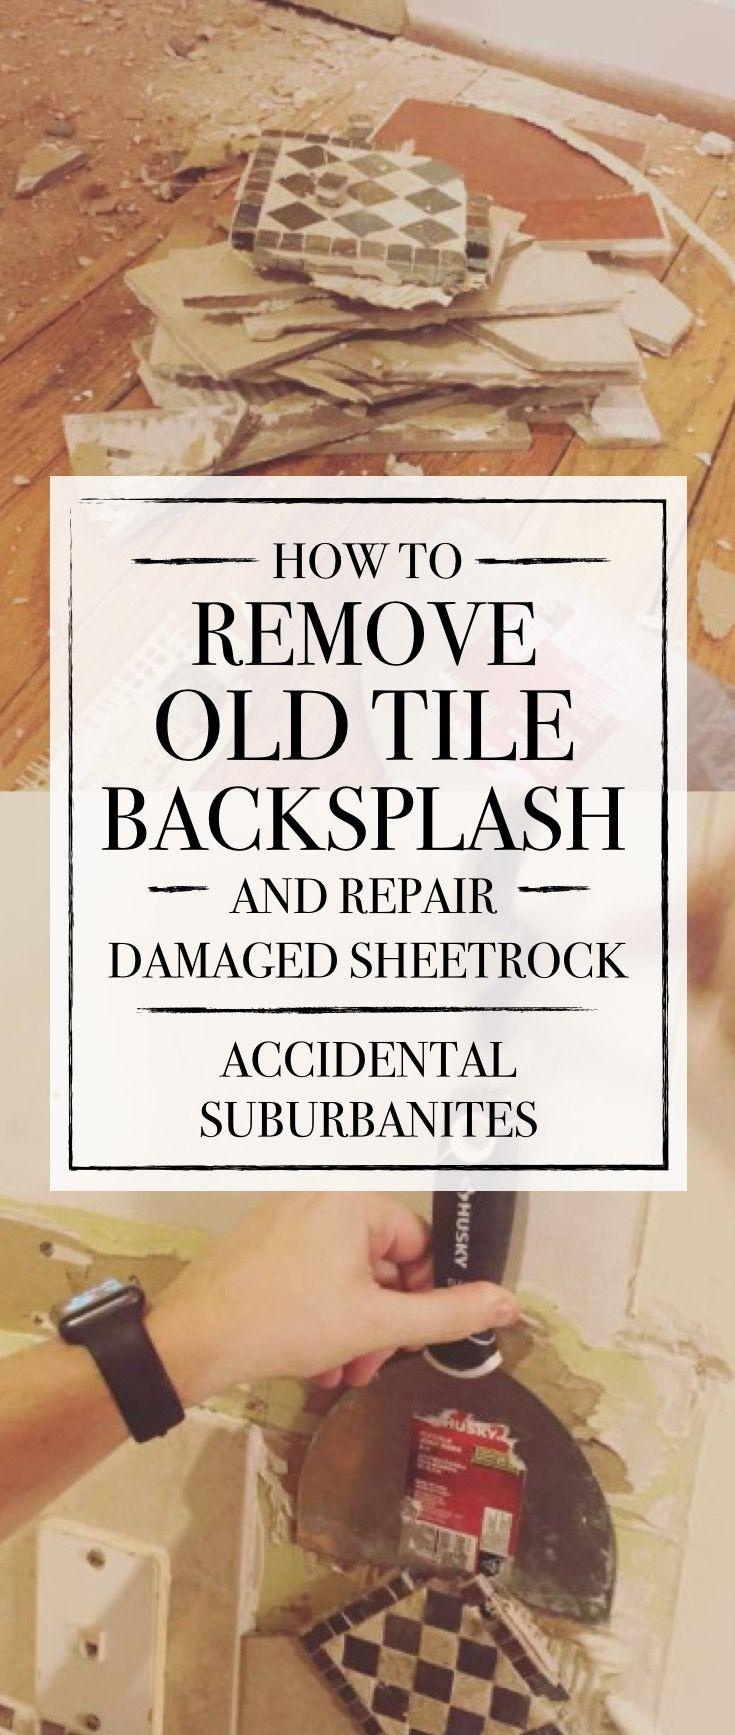 Bye Bye Backsplash How To Remove Old Tile Backsplash And Repair